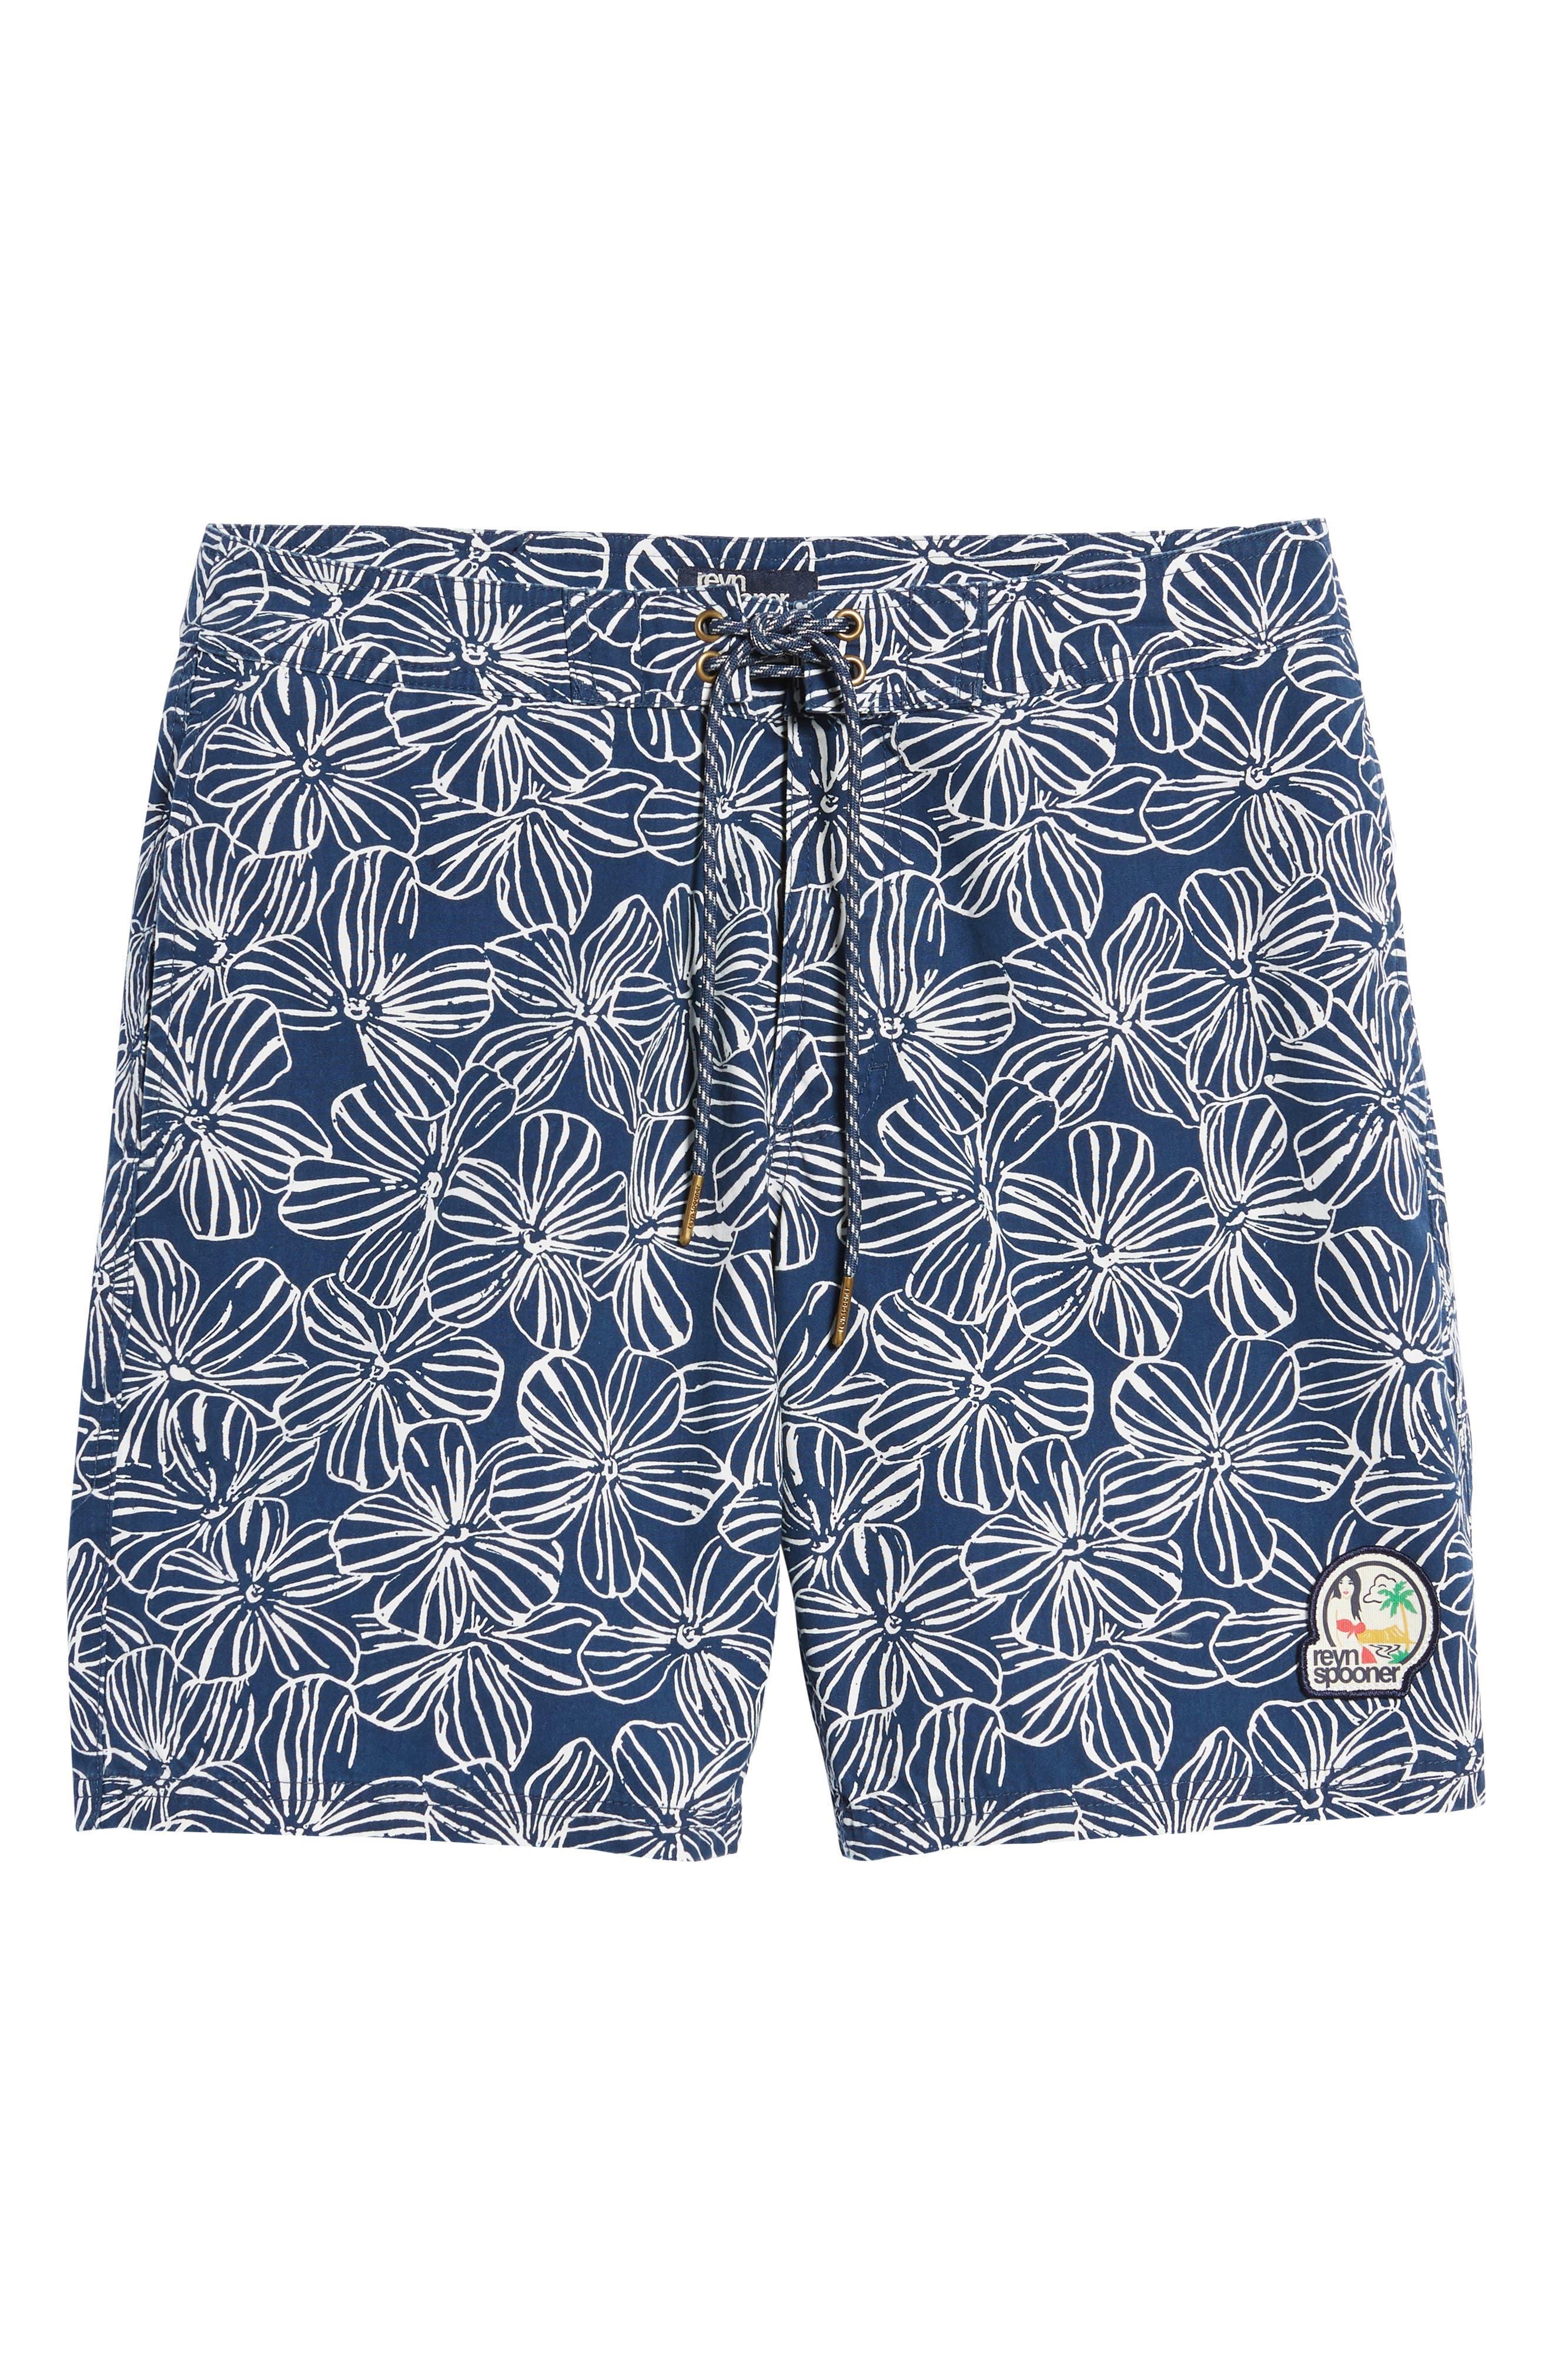 Mala Melia Regular Fit Board Shorts,                             Alternate thumbnail 6, color,                             BLUE